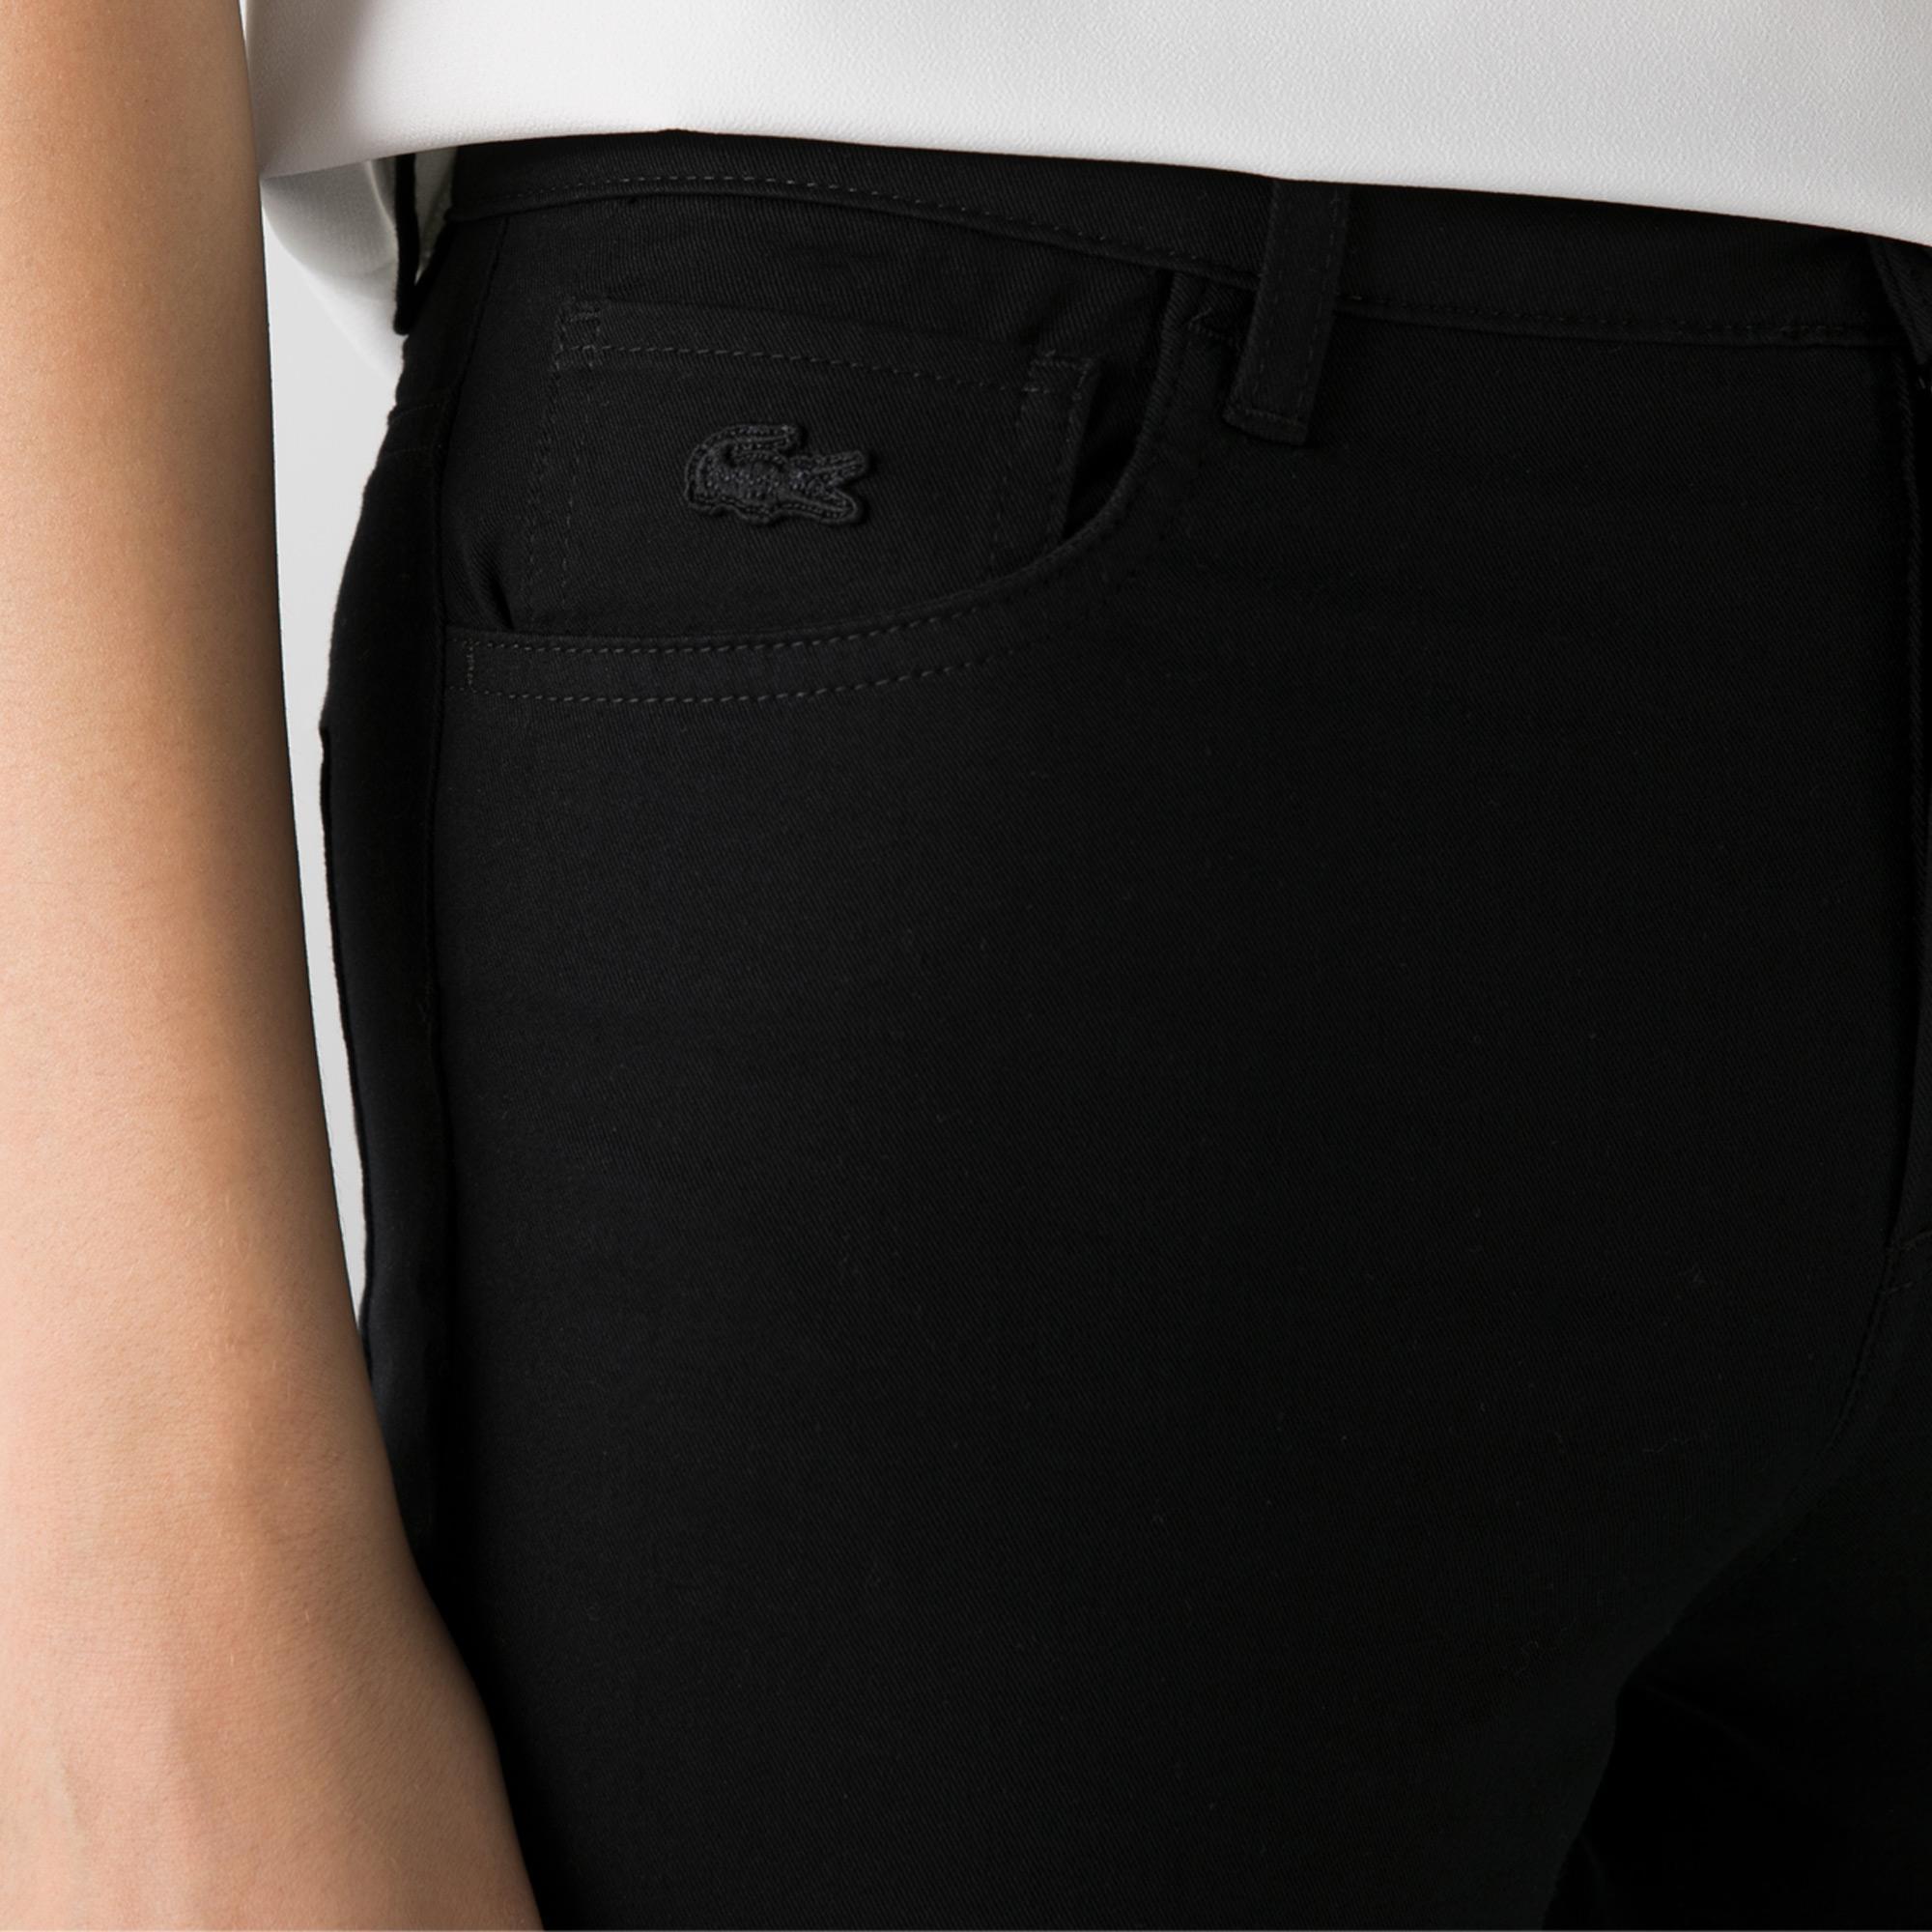 Lacoste Kadın Slim Fit Siyah Pantolon